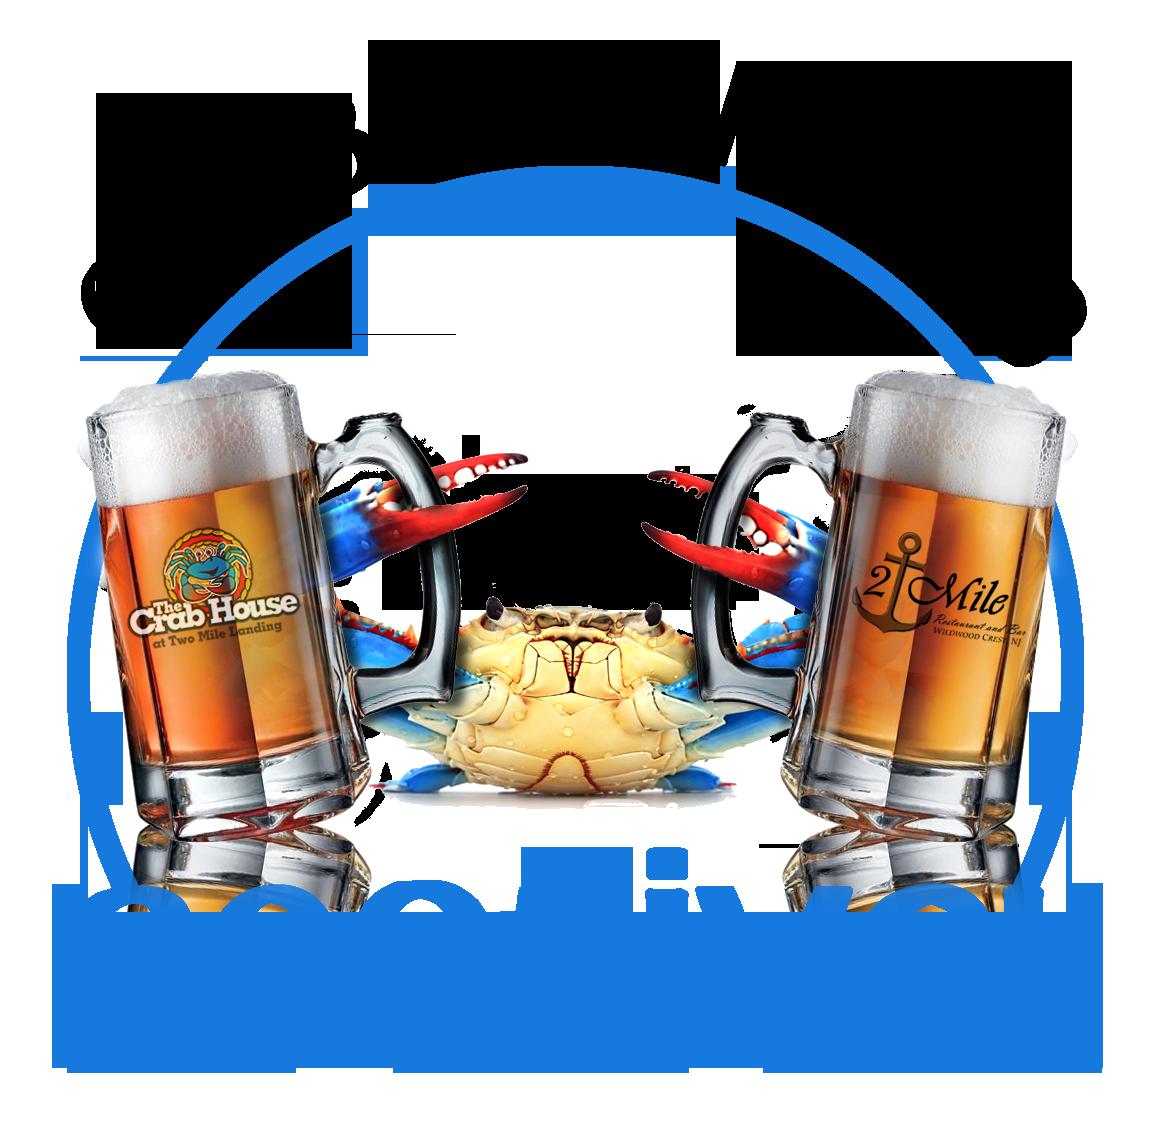 BeerCraftFestival Billboardlogo